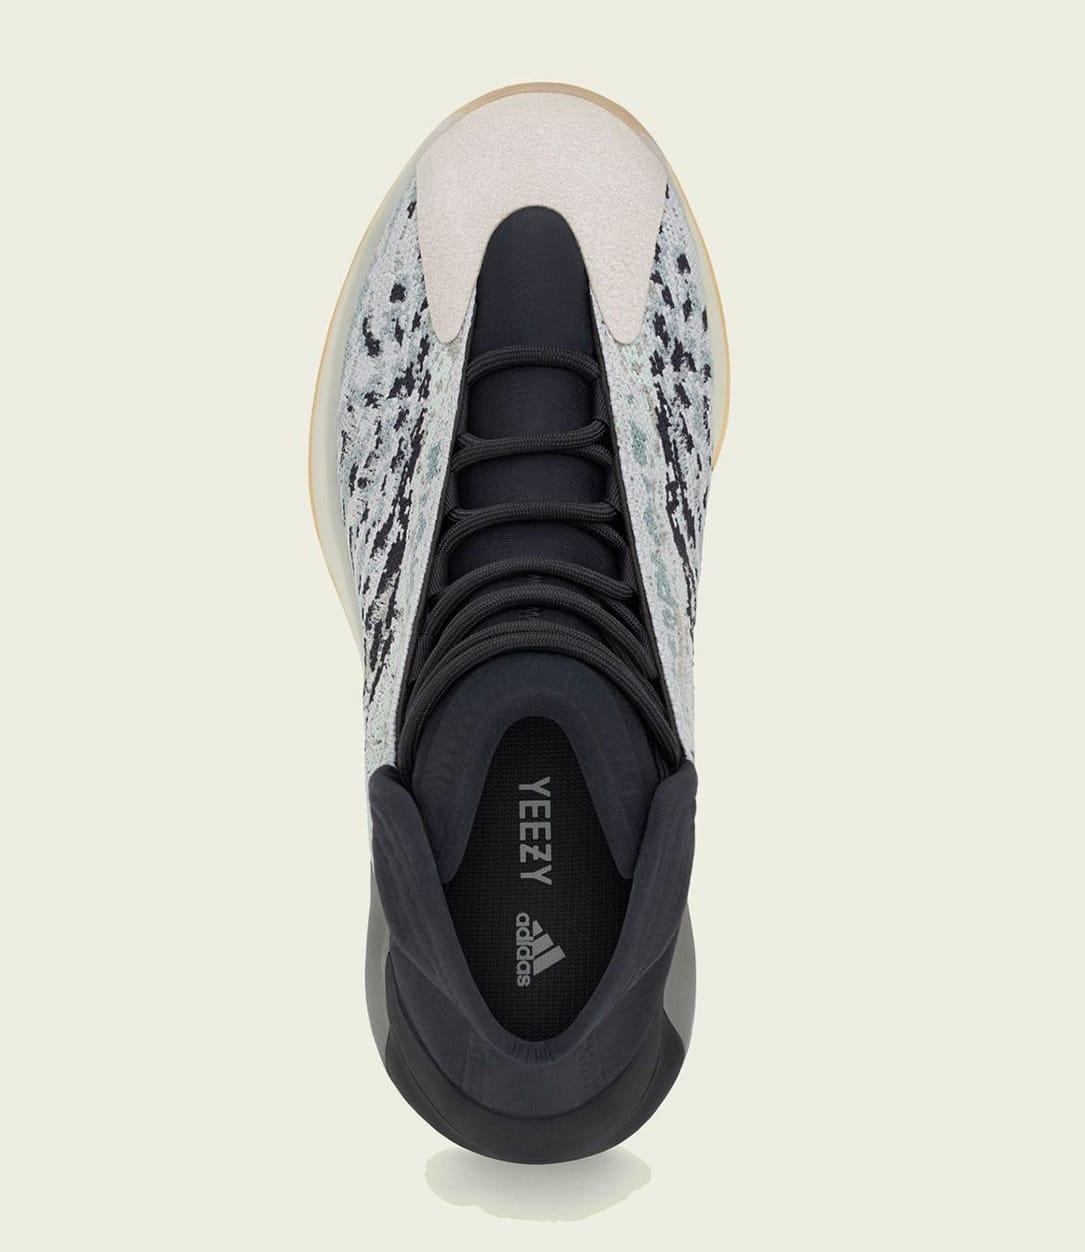 Adidas Yeezy QNTM 'Sea Teal' GY7926 Top